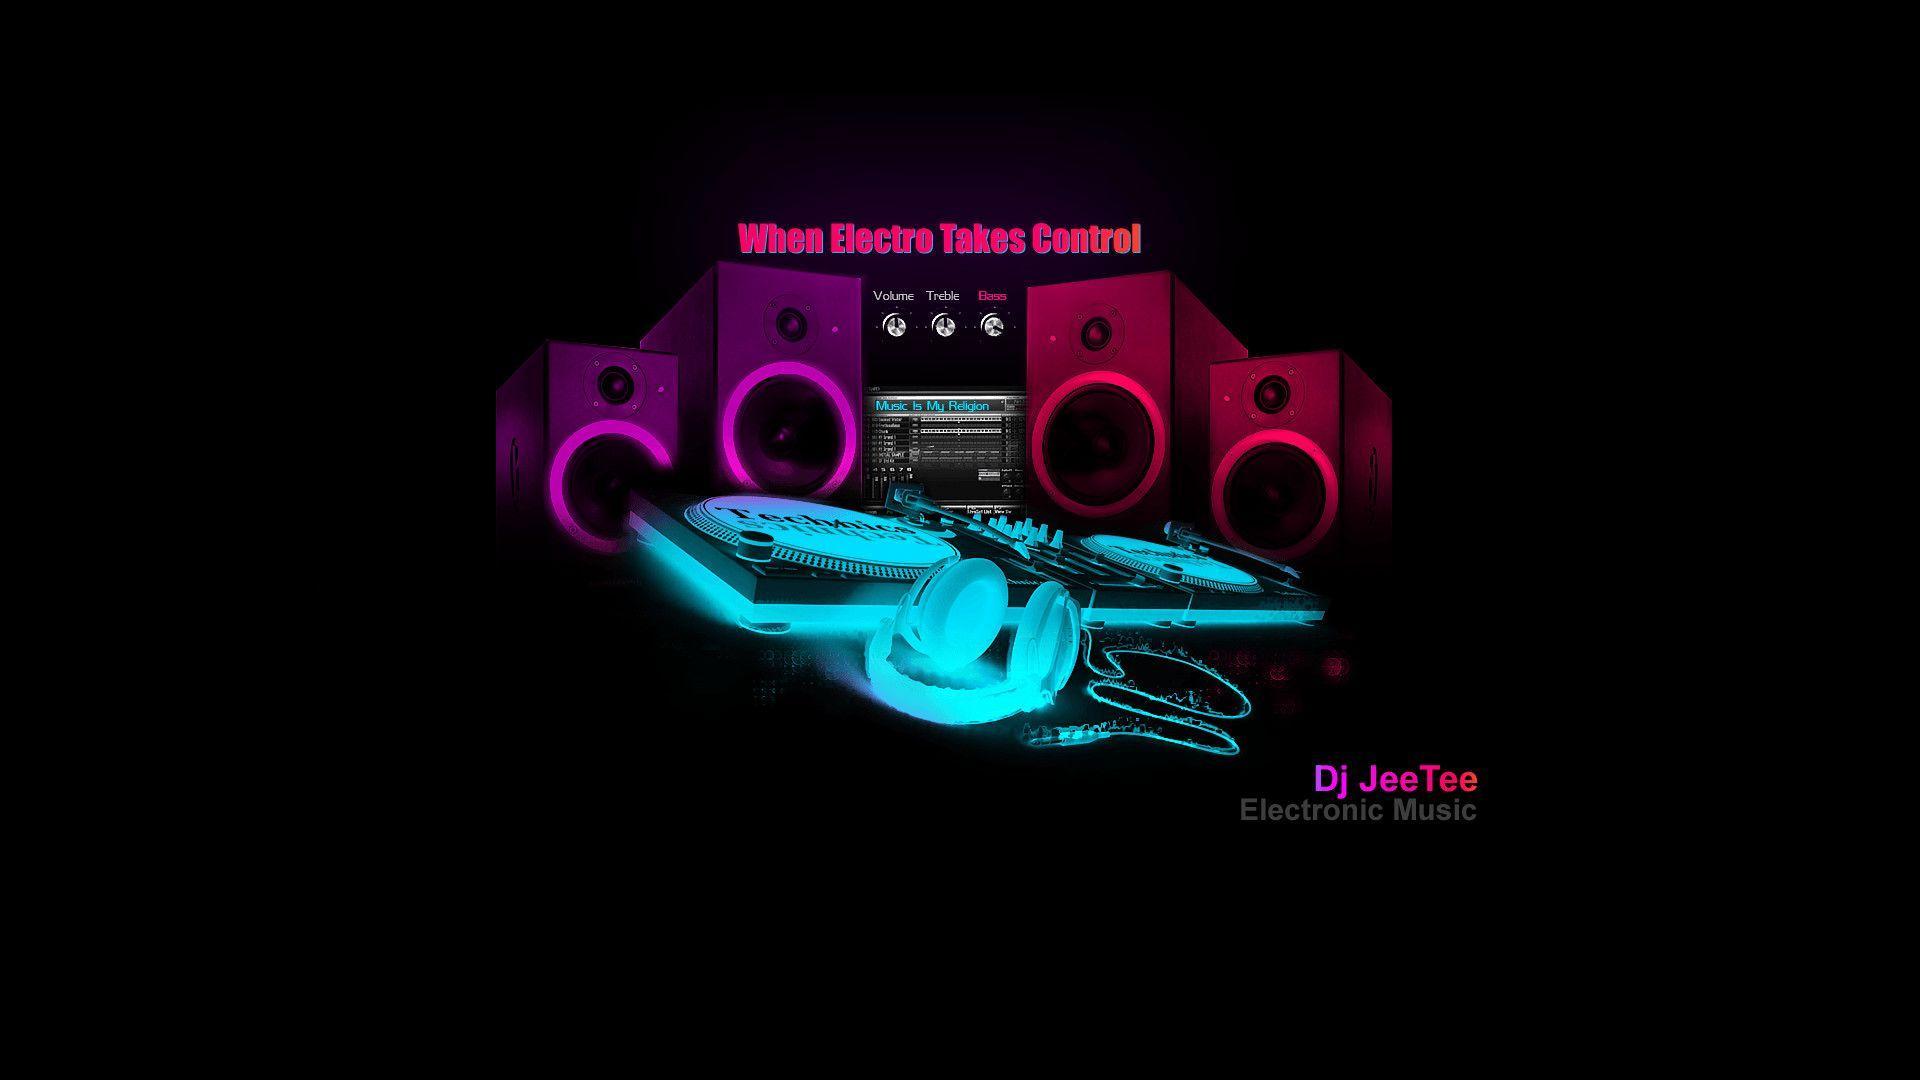 Dj Music Wallpapers - Top Free Dj Music Backgrounds - WallpaperAccess